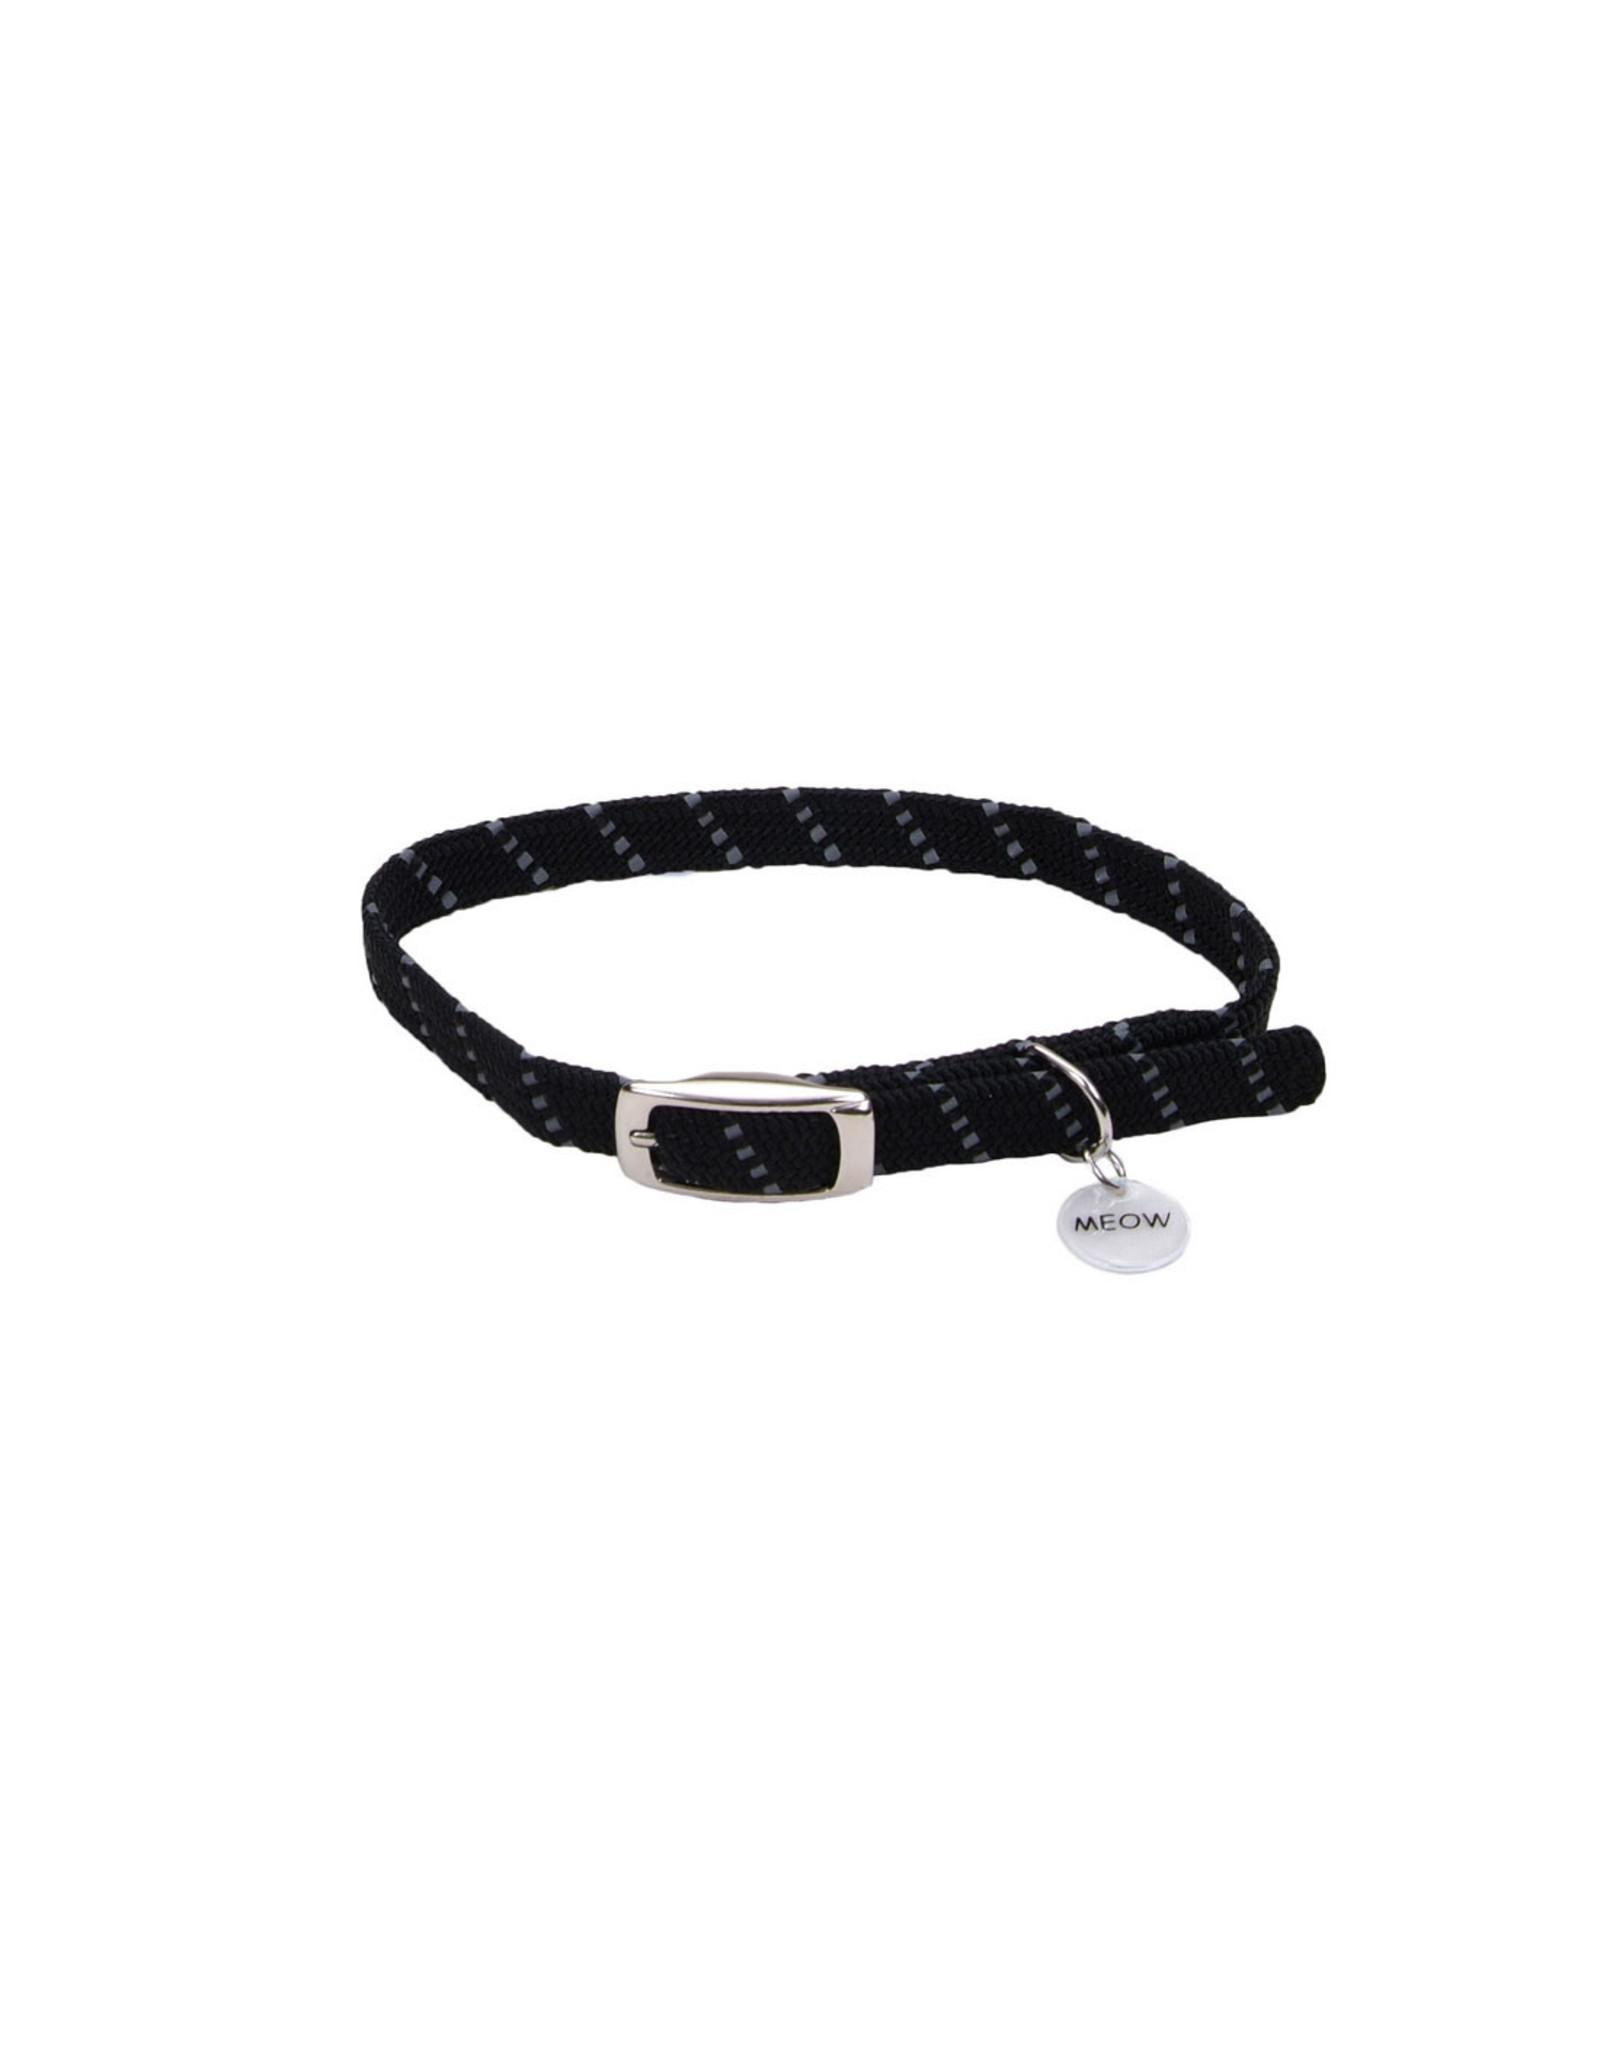 ElastaCat Reflective Safety Stretch Cat Collar